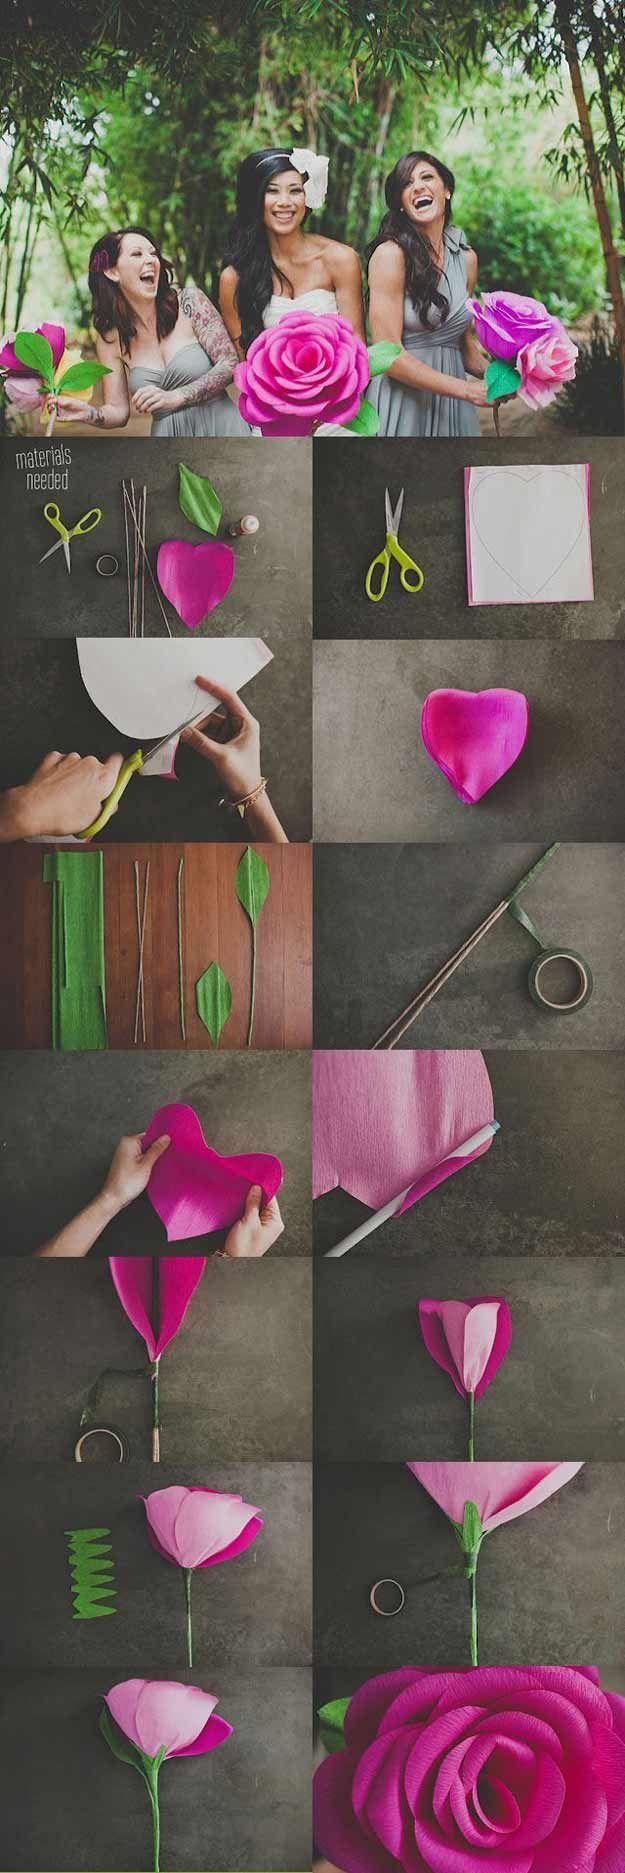 Unique Homemade DIY Photo Booth Props | DIY Giant Paper Rose by DIY Ready at diyready.com/...                                                                                                                                                      Más